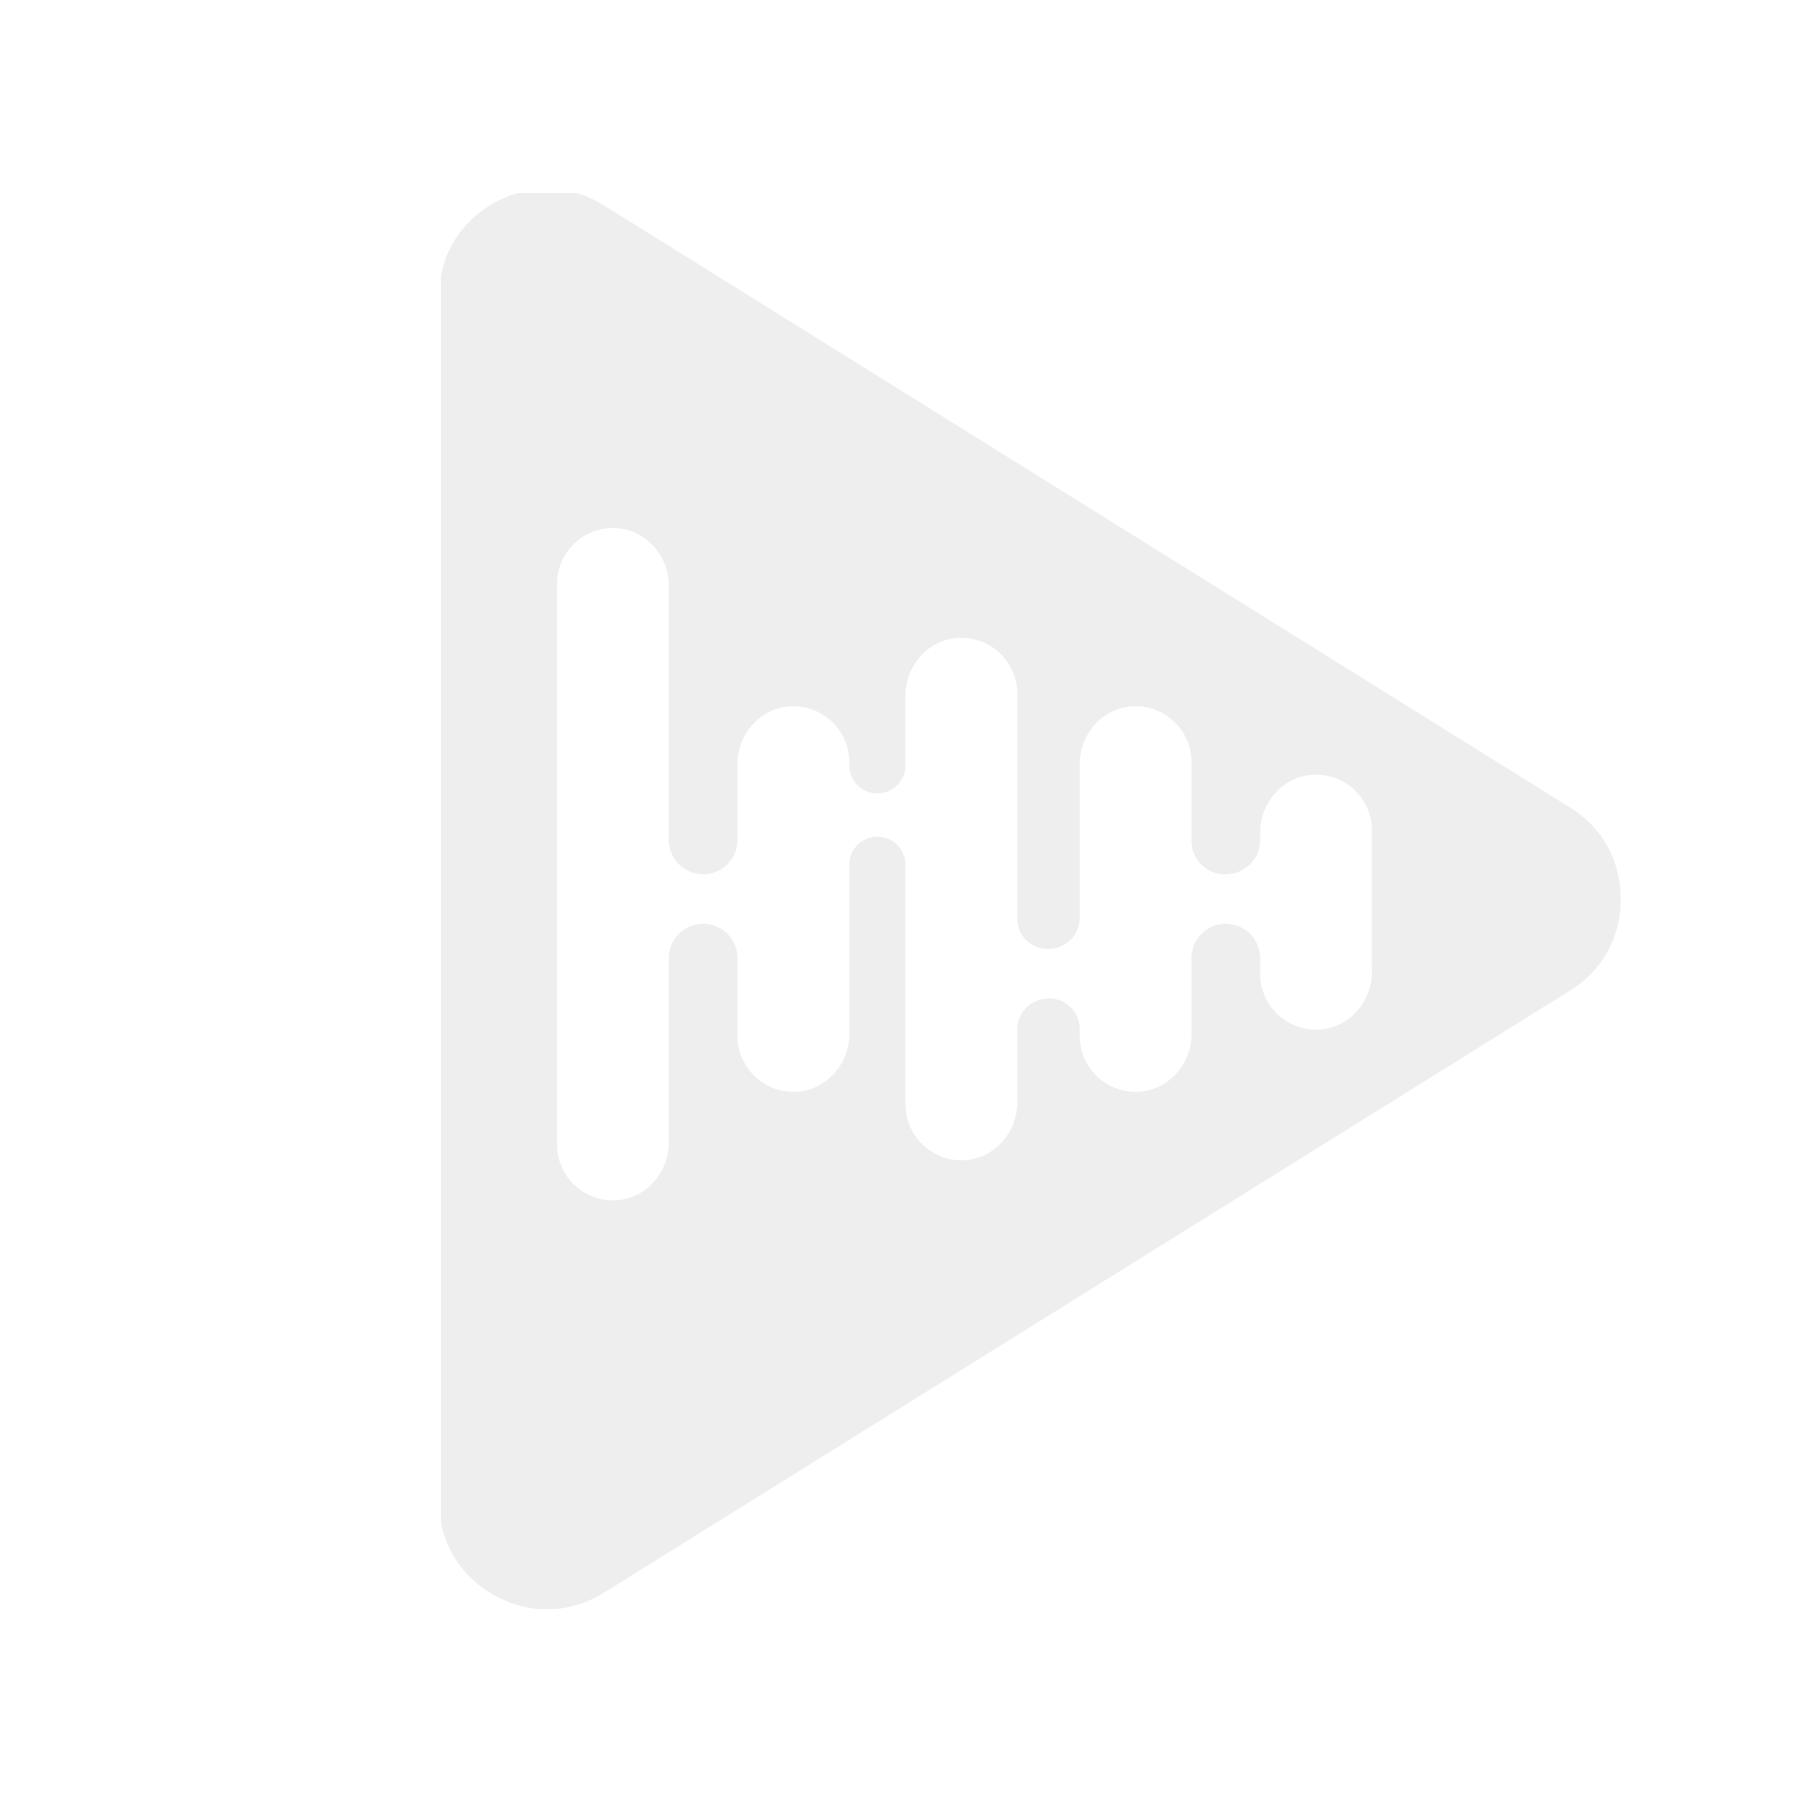 Epson 158198400 - Fjernkontroll, demovare